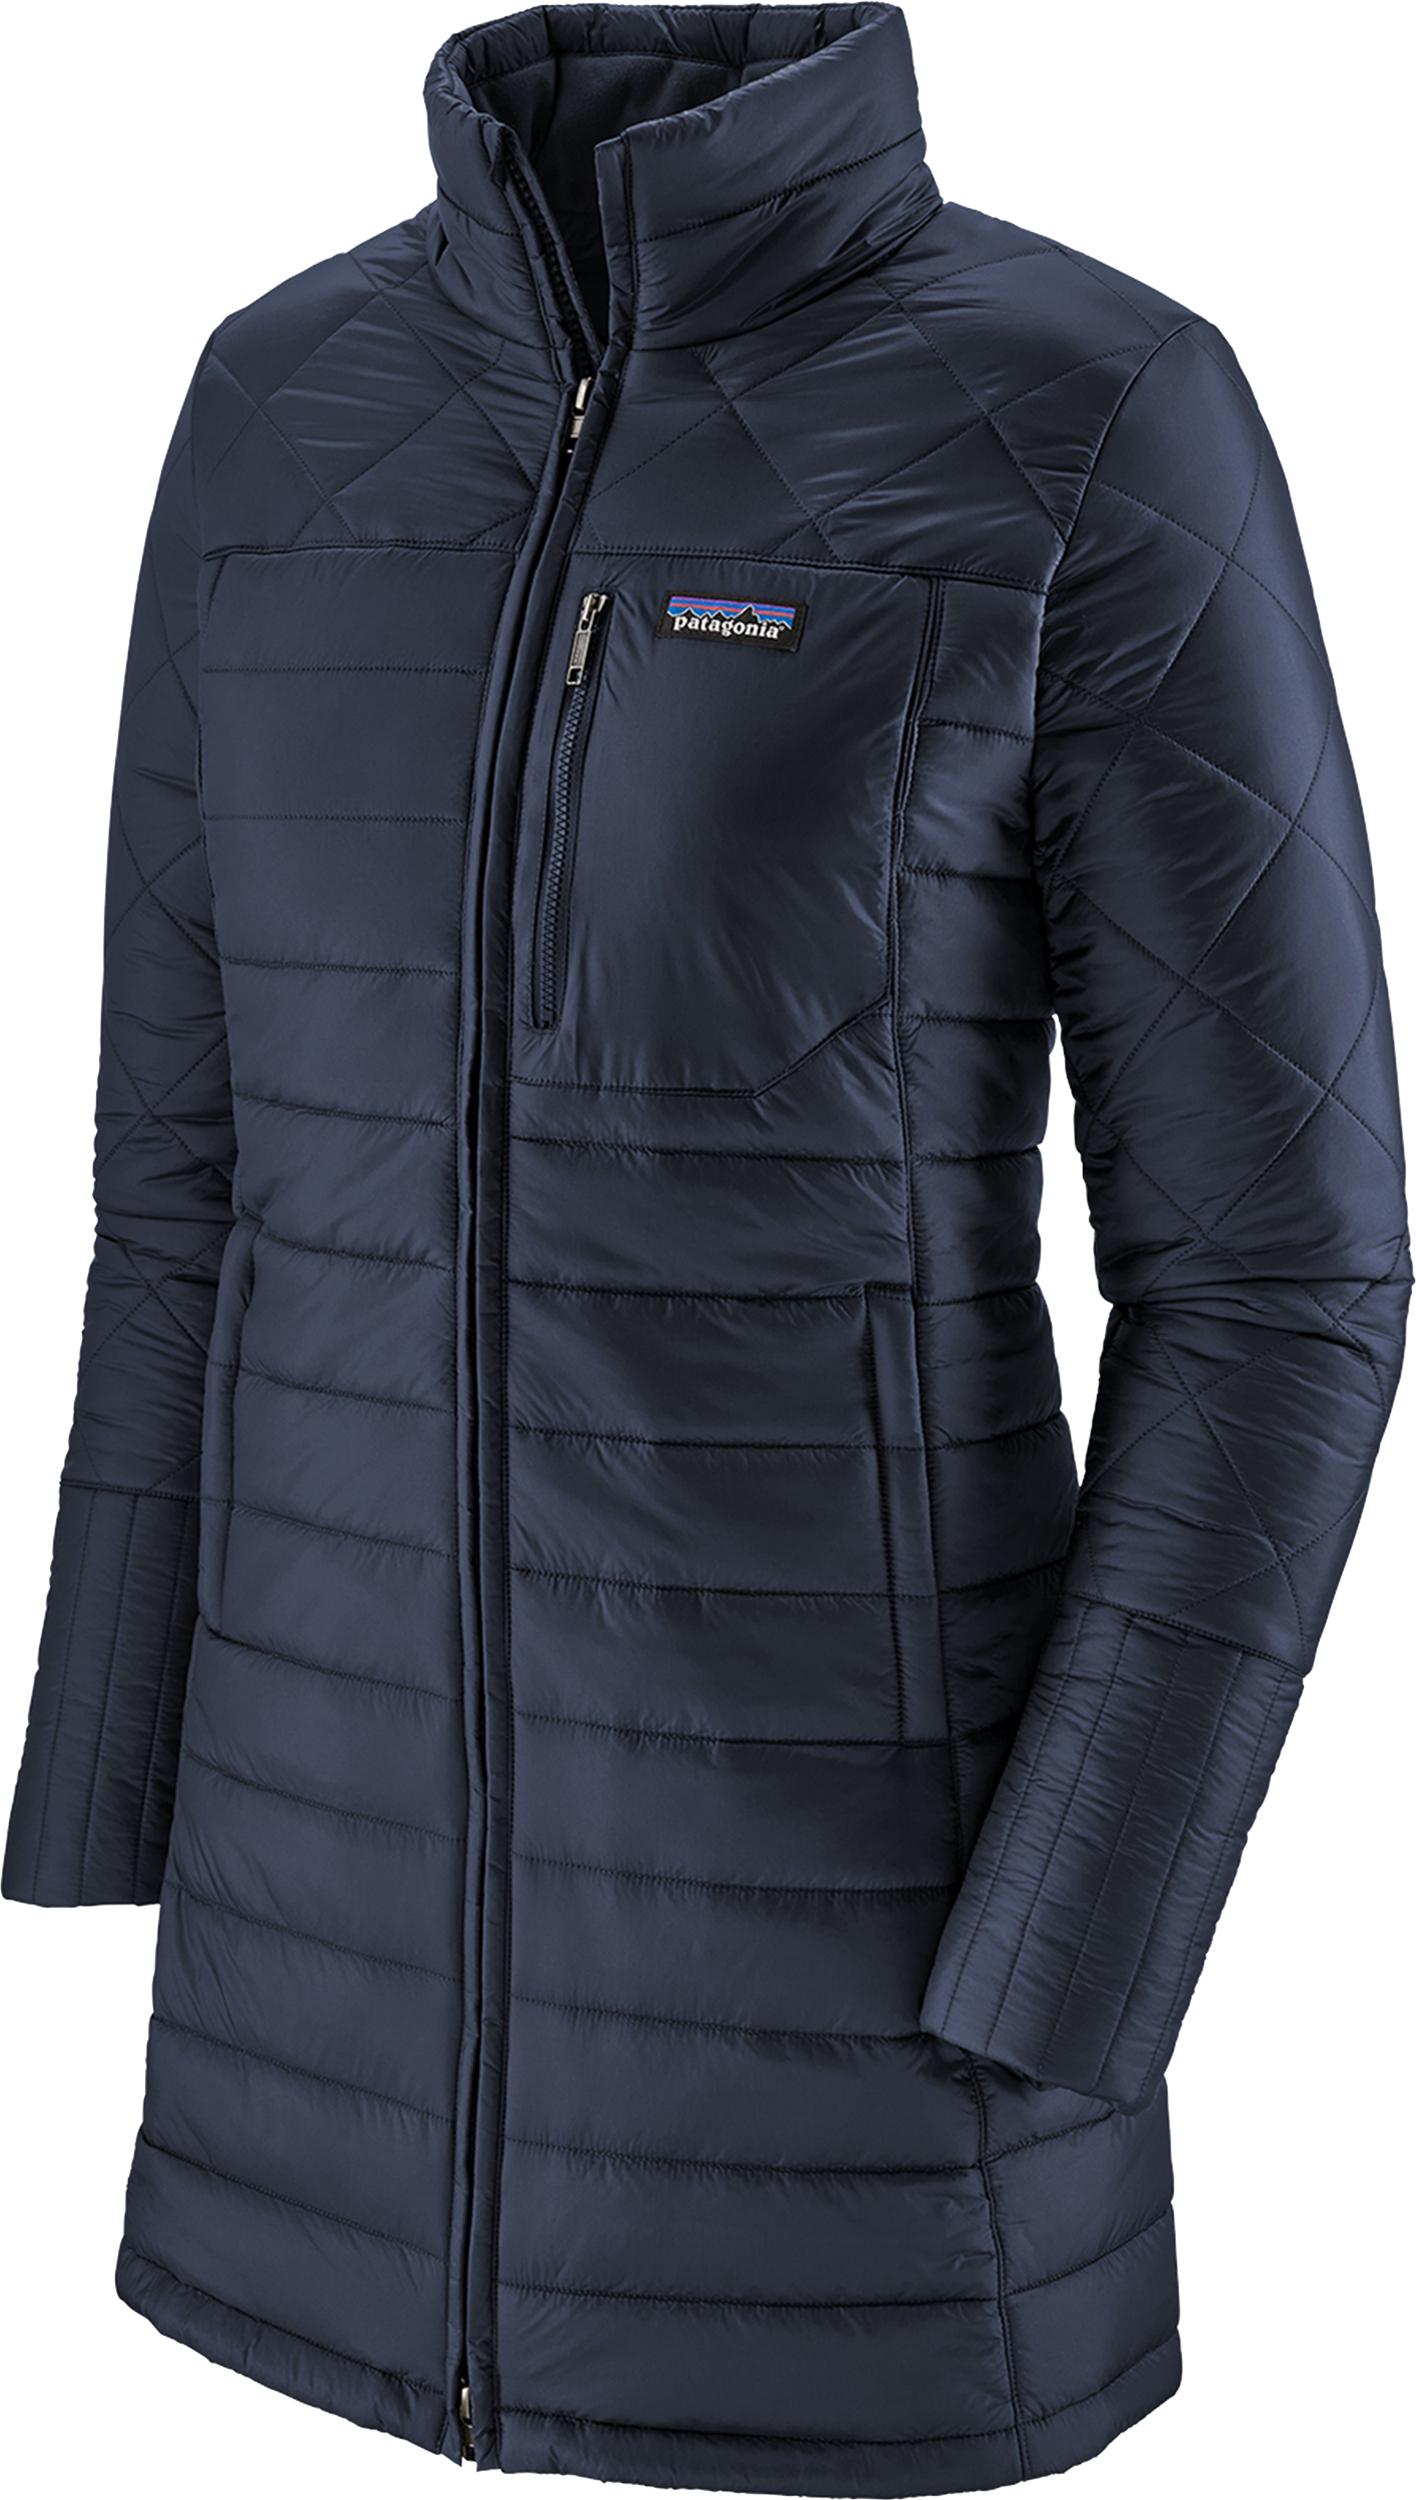 0e941c619 Insulated jackets | MEC